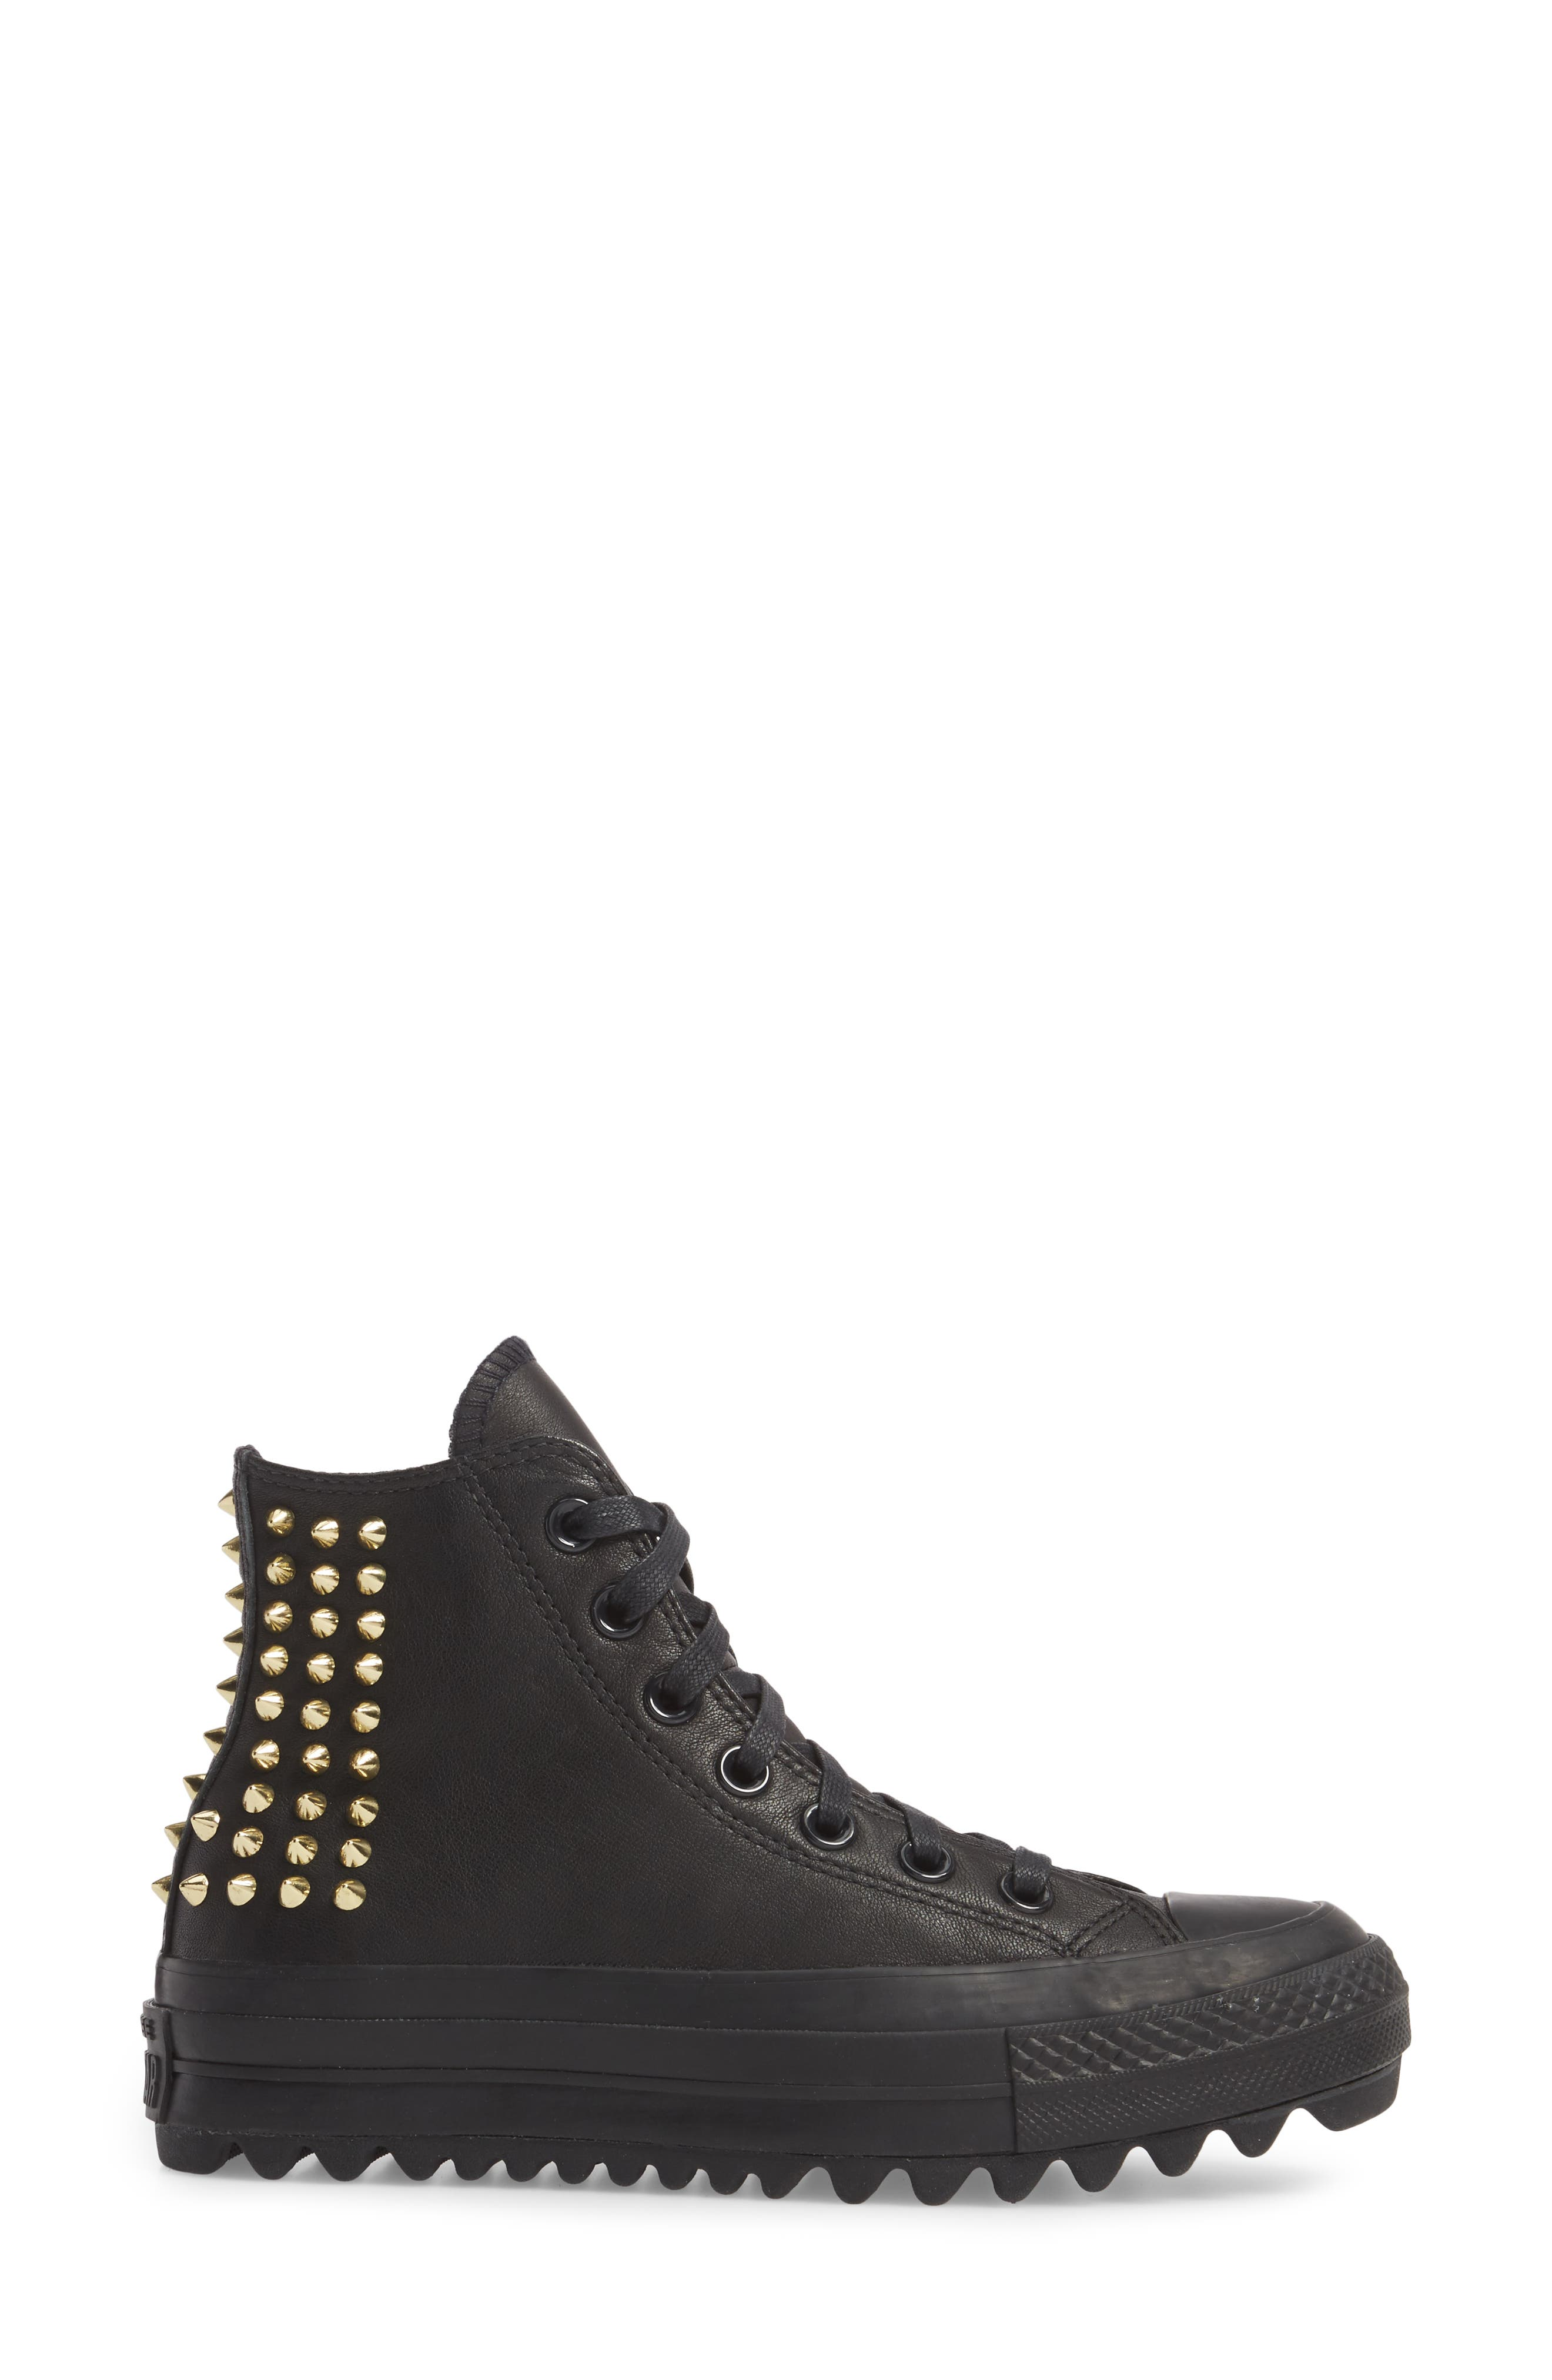 Alternate Image 3  - Converse Chuck Taylor® All Star® Lift Ripple Studded High Top Sneaker (Women)